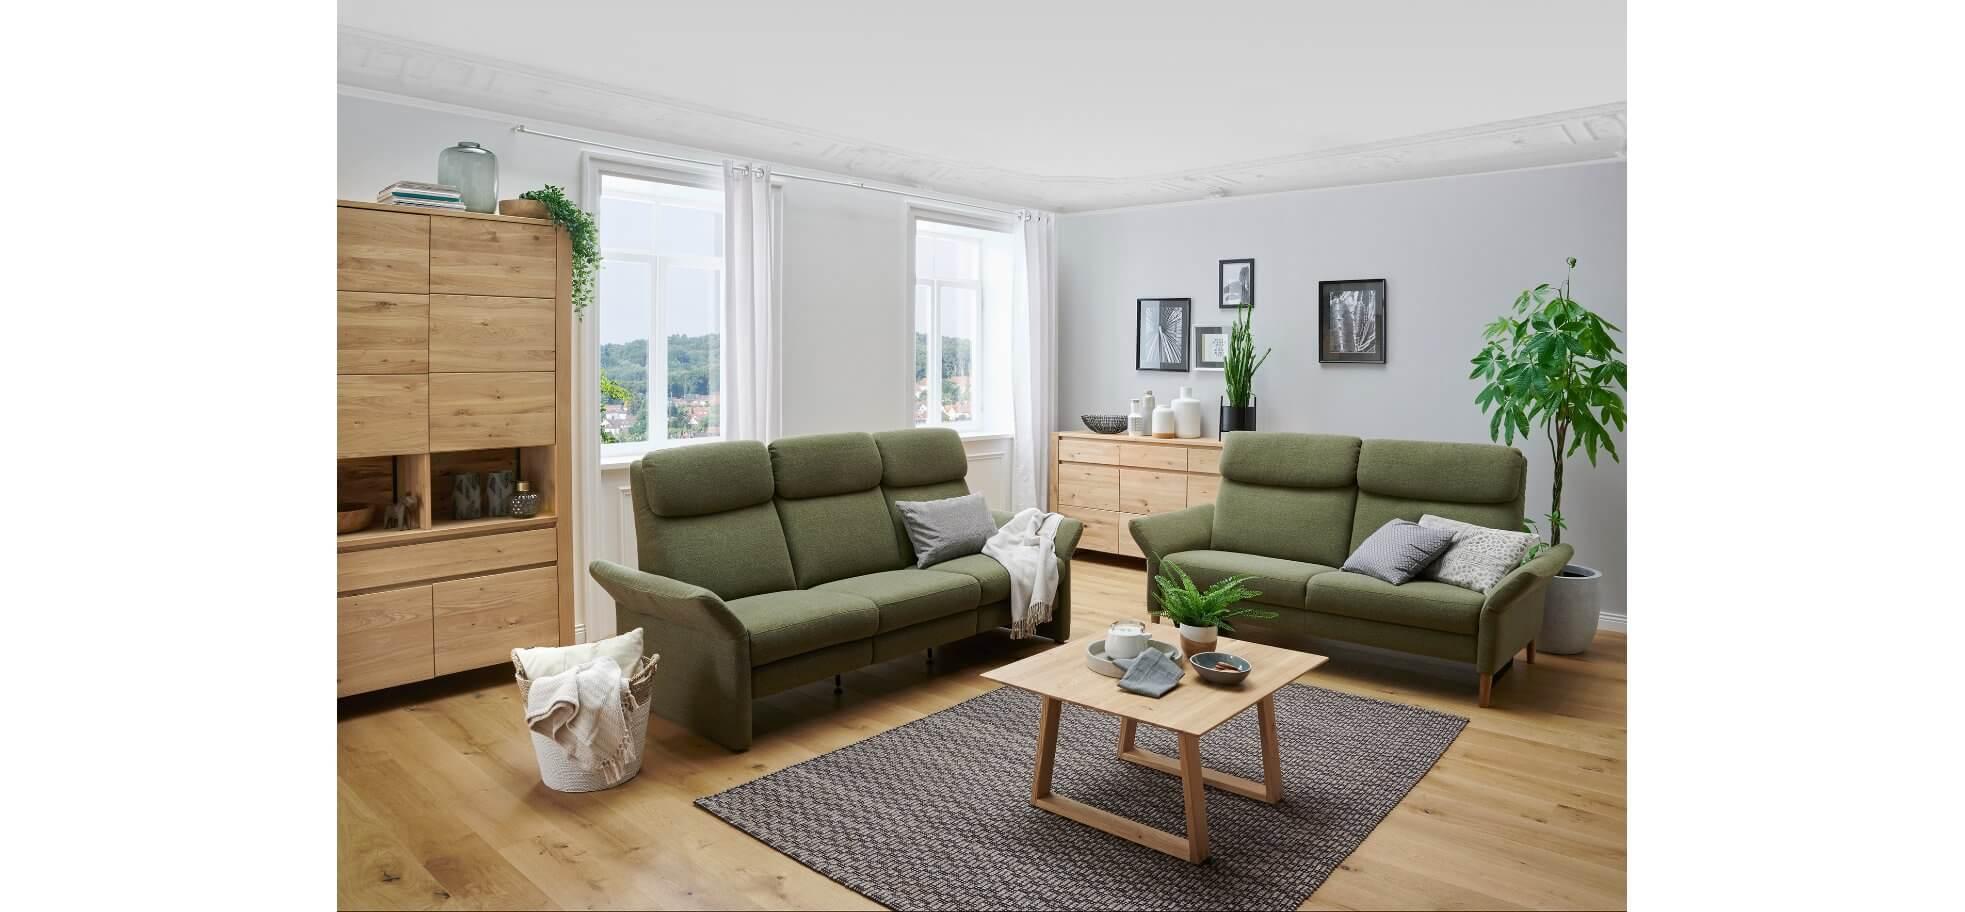 Full Size of Sofa 2 5 Sitzer Inhofer Bett Massivholz 180x200 Betten 160x200 Bunt 3 Grau Impressionen Esstisch 120x80 Canape Home Affair 2er 120x200 Mit Relaxfunktion Sofa Sofa 2 5 Sitzer